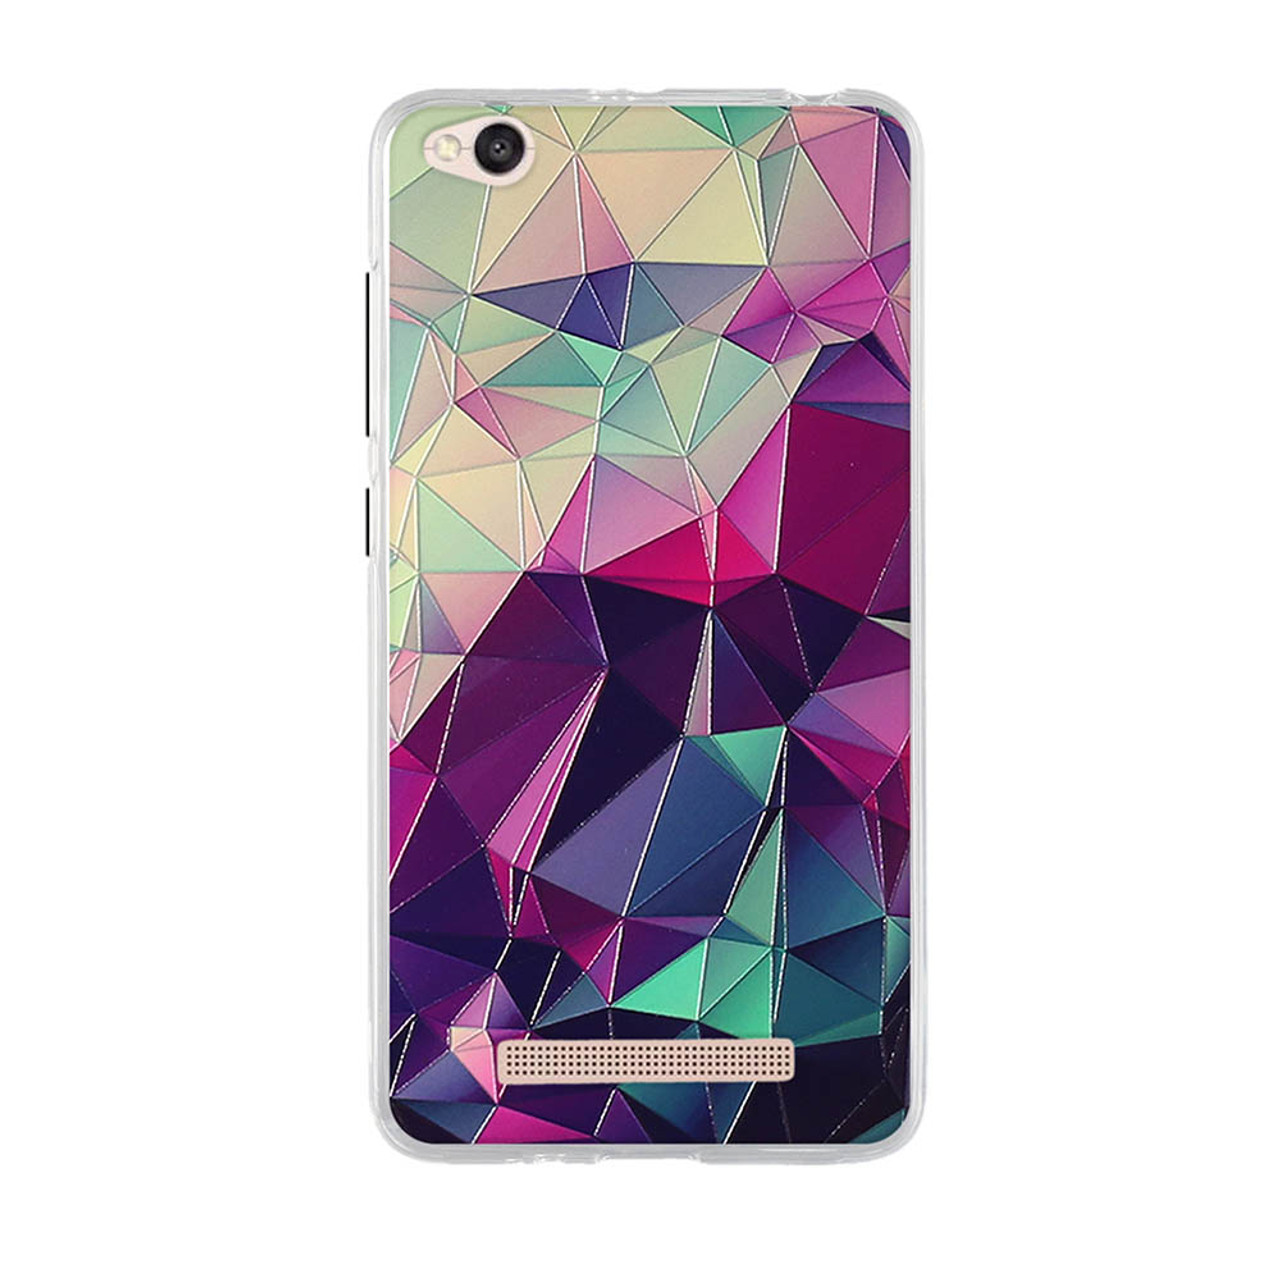 85703ec4dff ... For Xiaomi Redmi 4A 4X Case Soft TPU Silicone Fundas For xiomi Redmi 4A  4X Cover ...